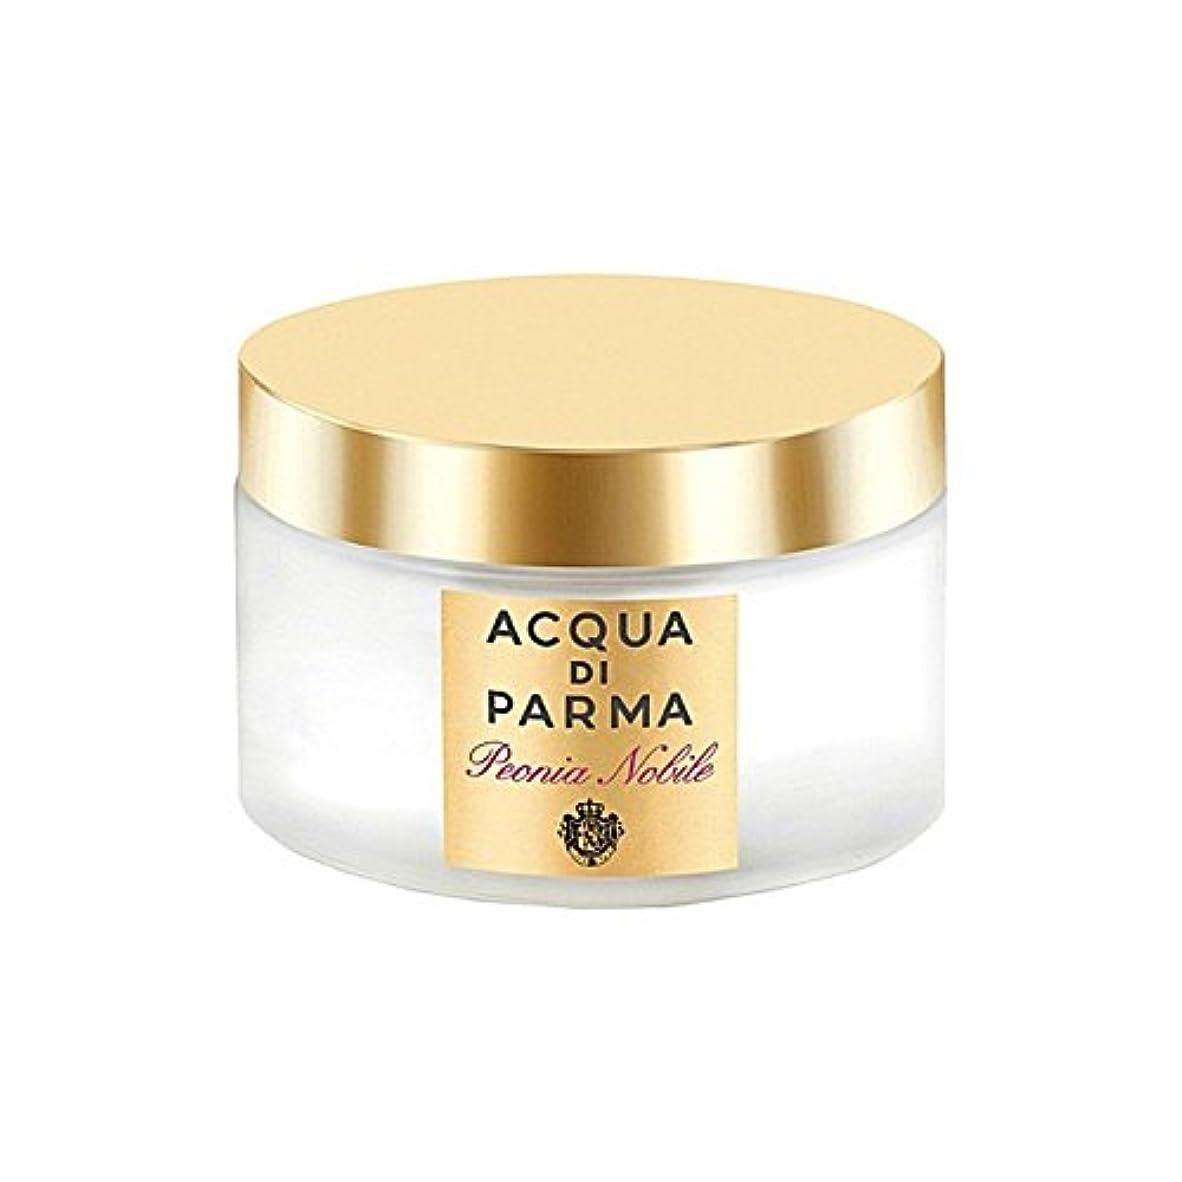 Acqua Di Parma Peonia Nobile Body Cream 150ml - アクアディパルマノビレボディクリーム150ミリリットル [並行輸入品]